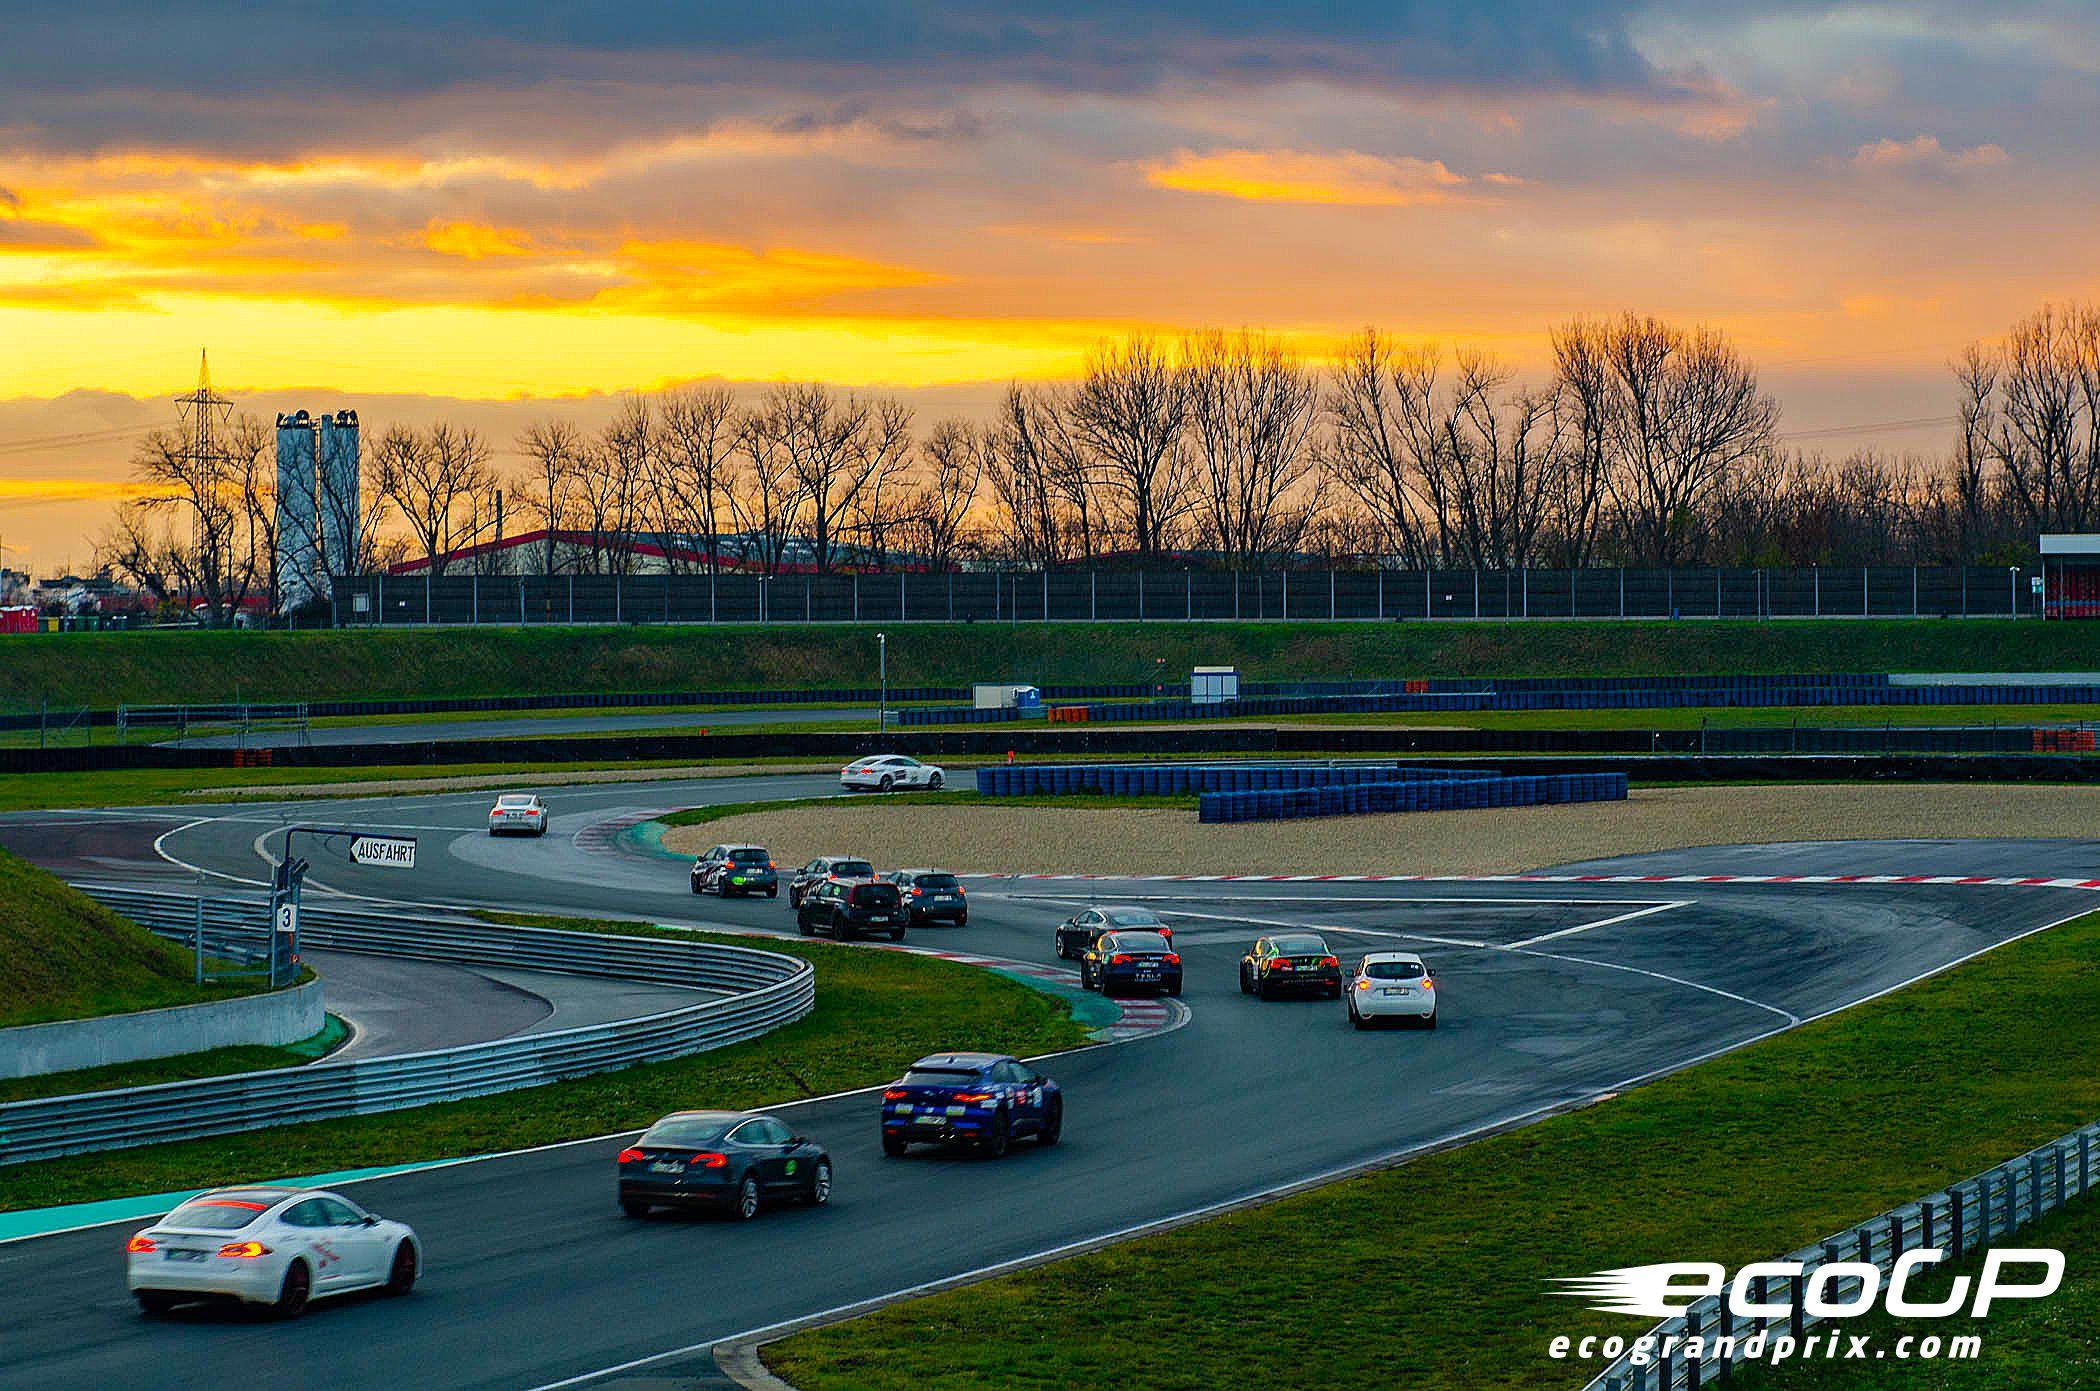 Eco Grand Prix